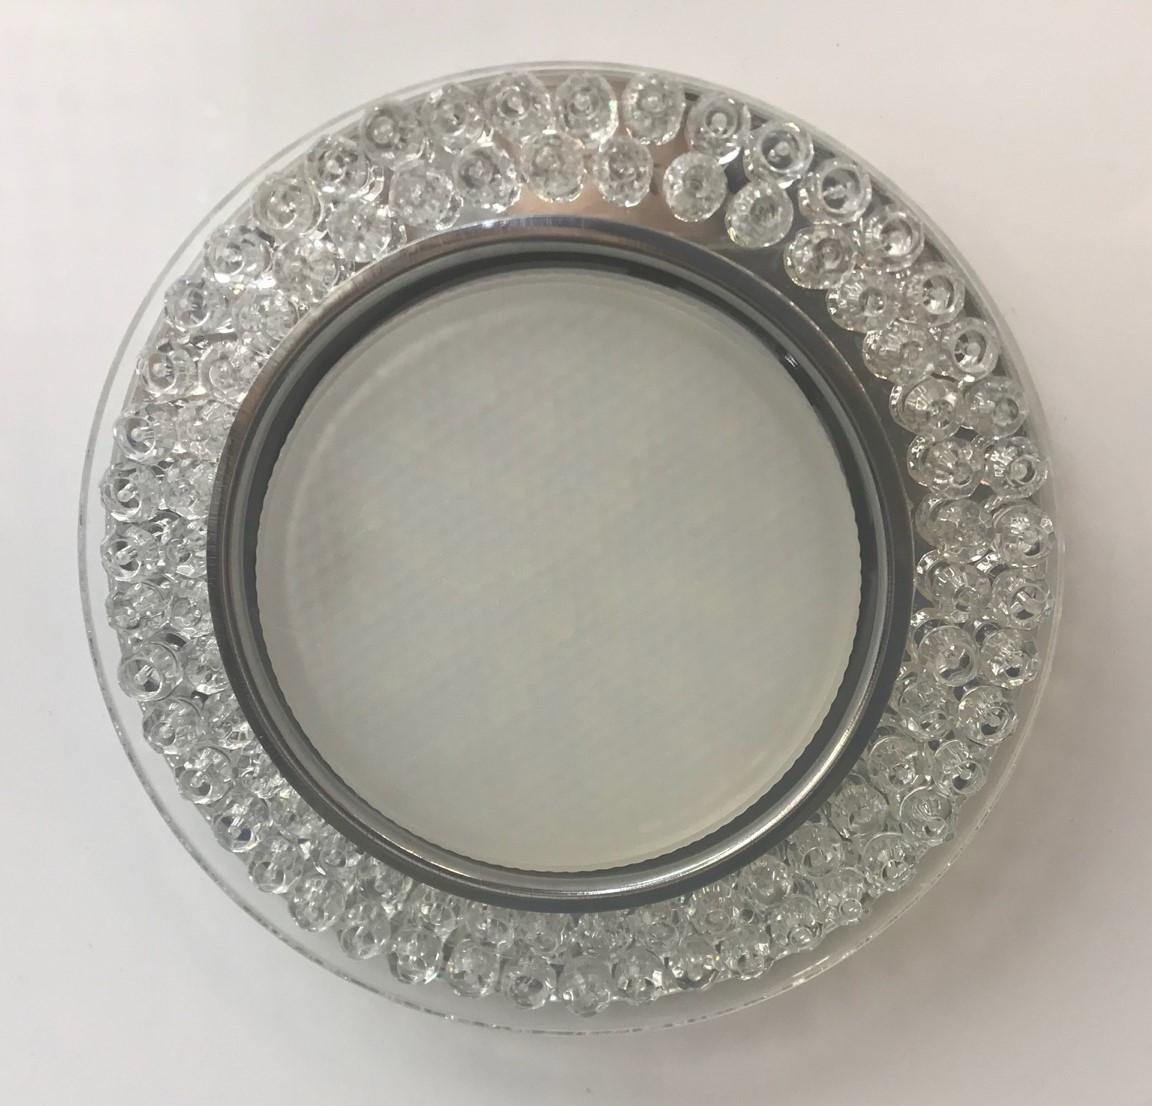 Светильник GX53 L240 прозрачное стекло + подсветка